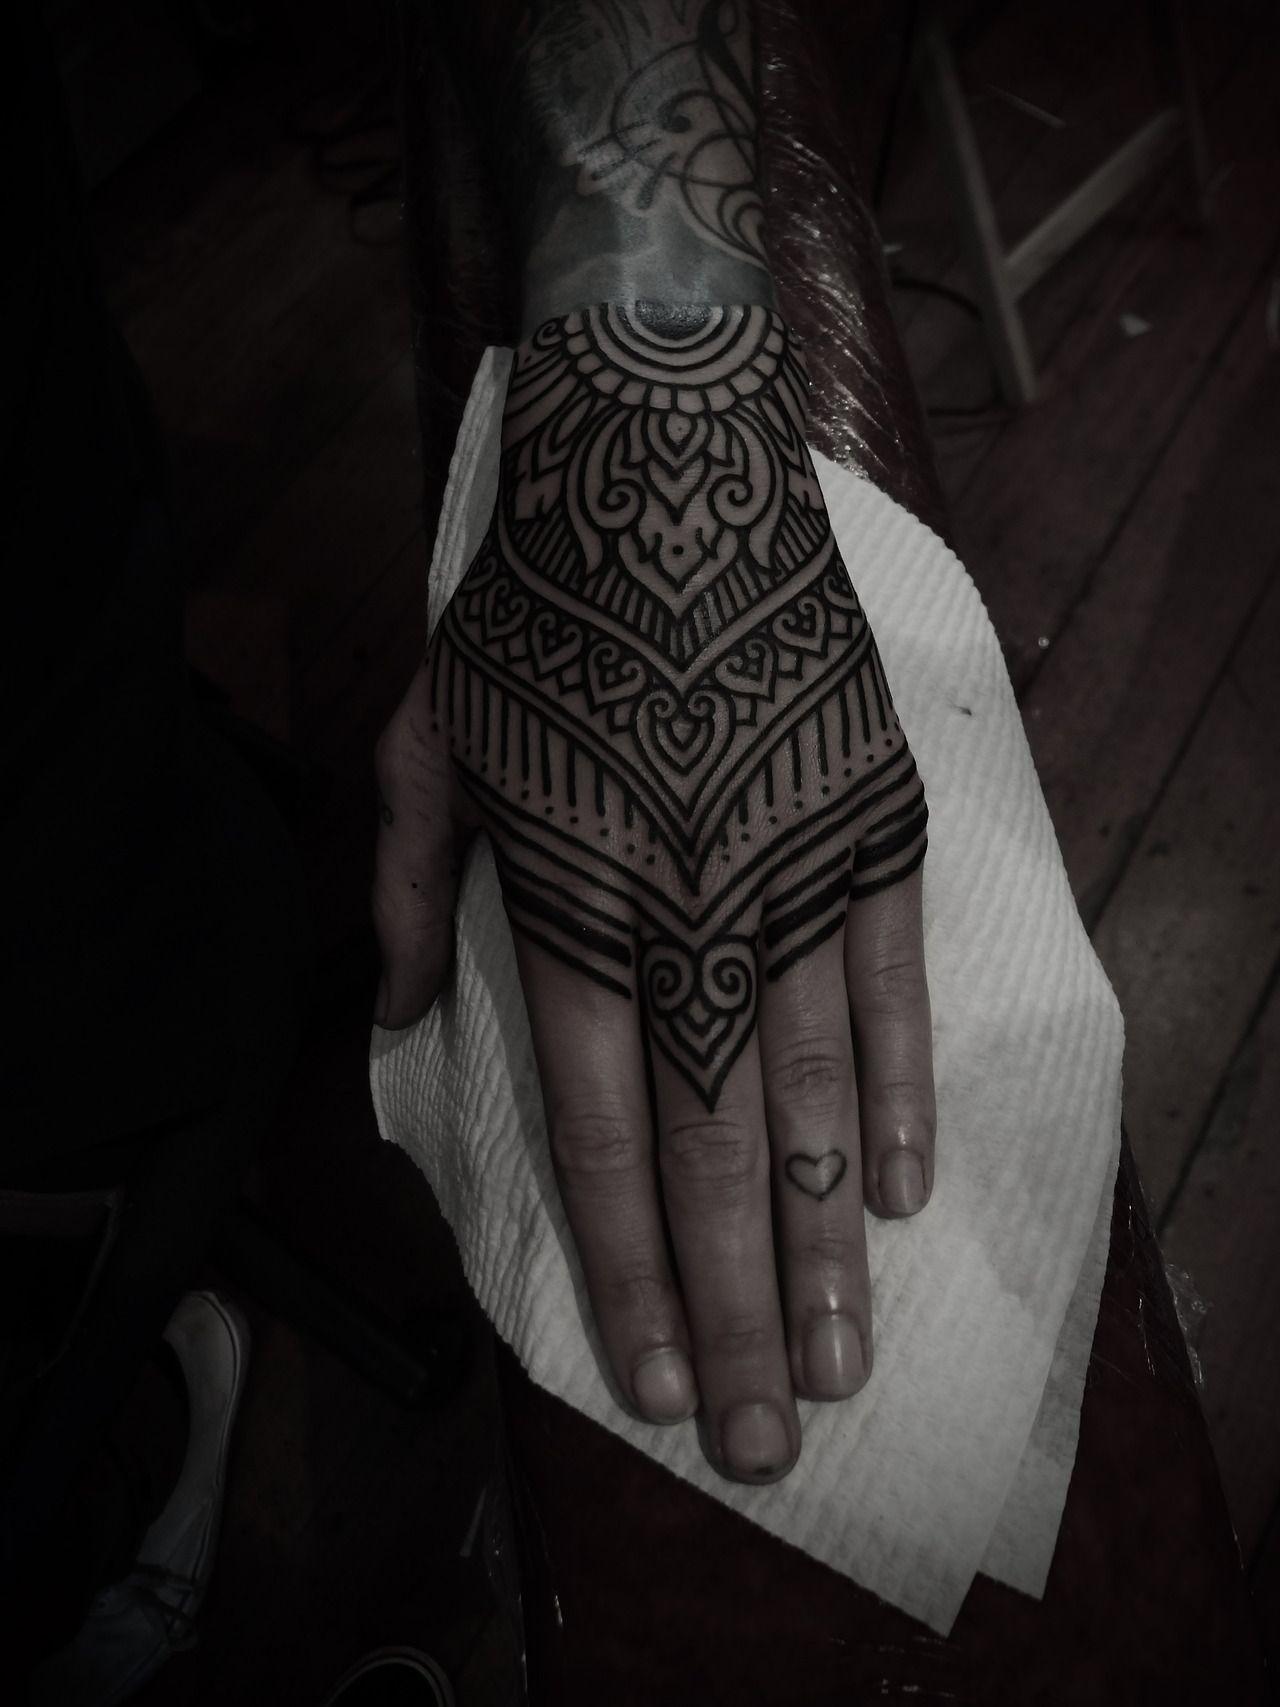 Cocoa Blush Mandala Hand Tattoos Body Art Tattoos Hand Tattoos